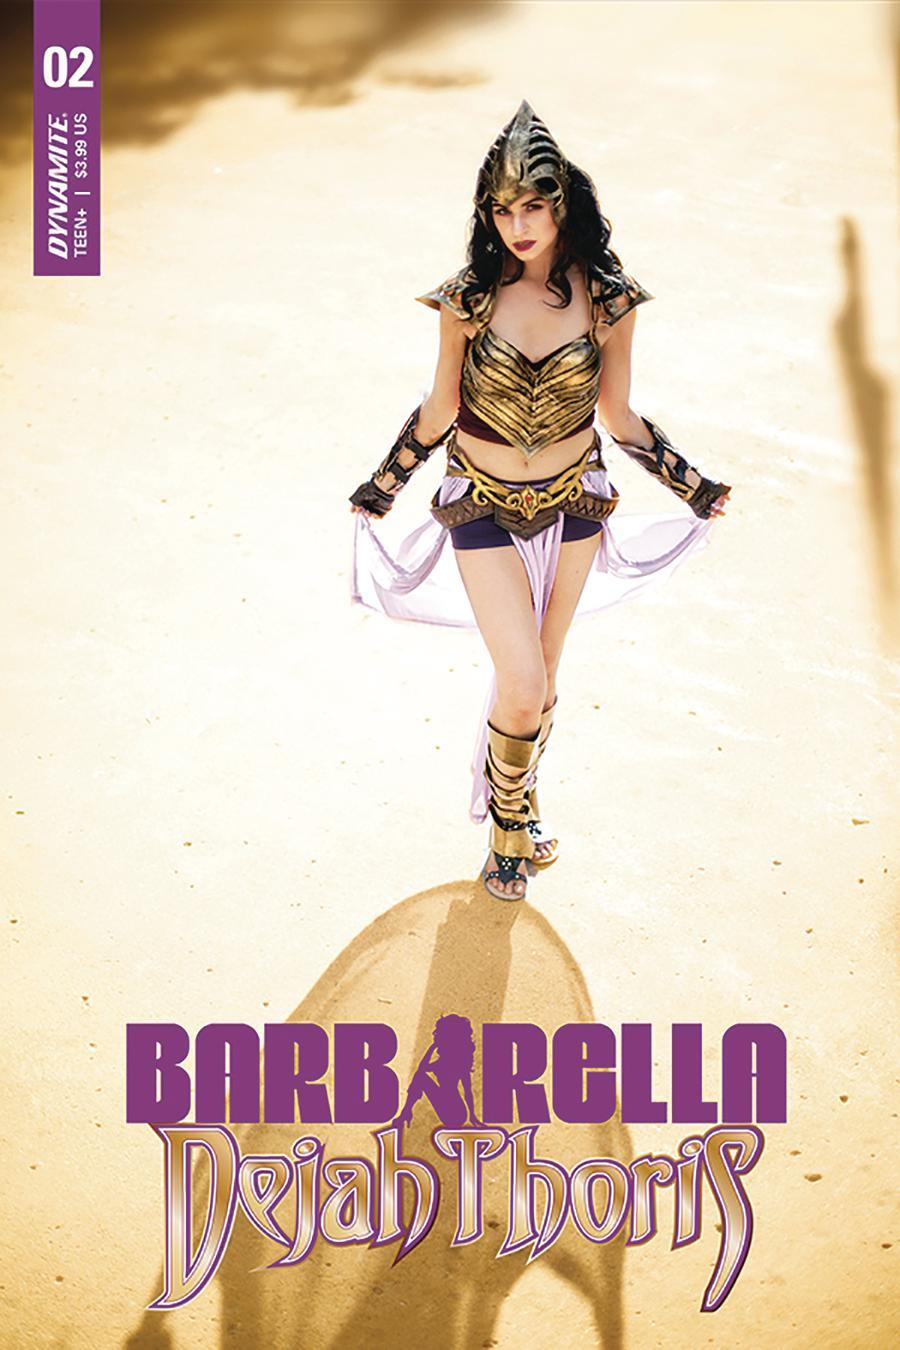 Barbarella Dejah Thoris #2 Cover E Variant Cosplay Photo Cover